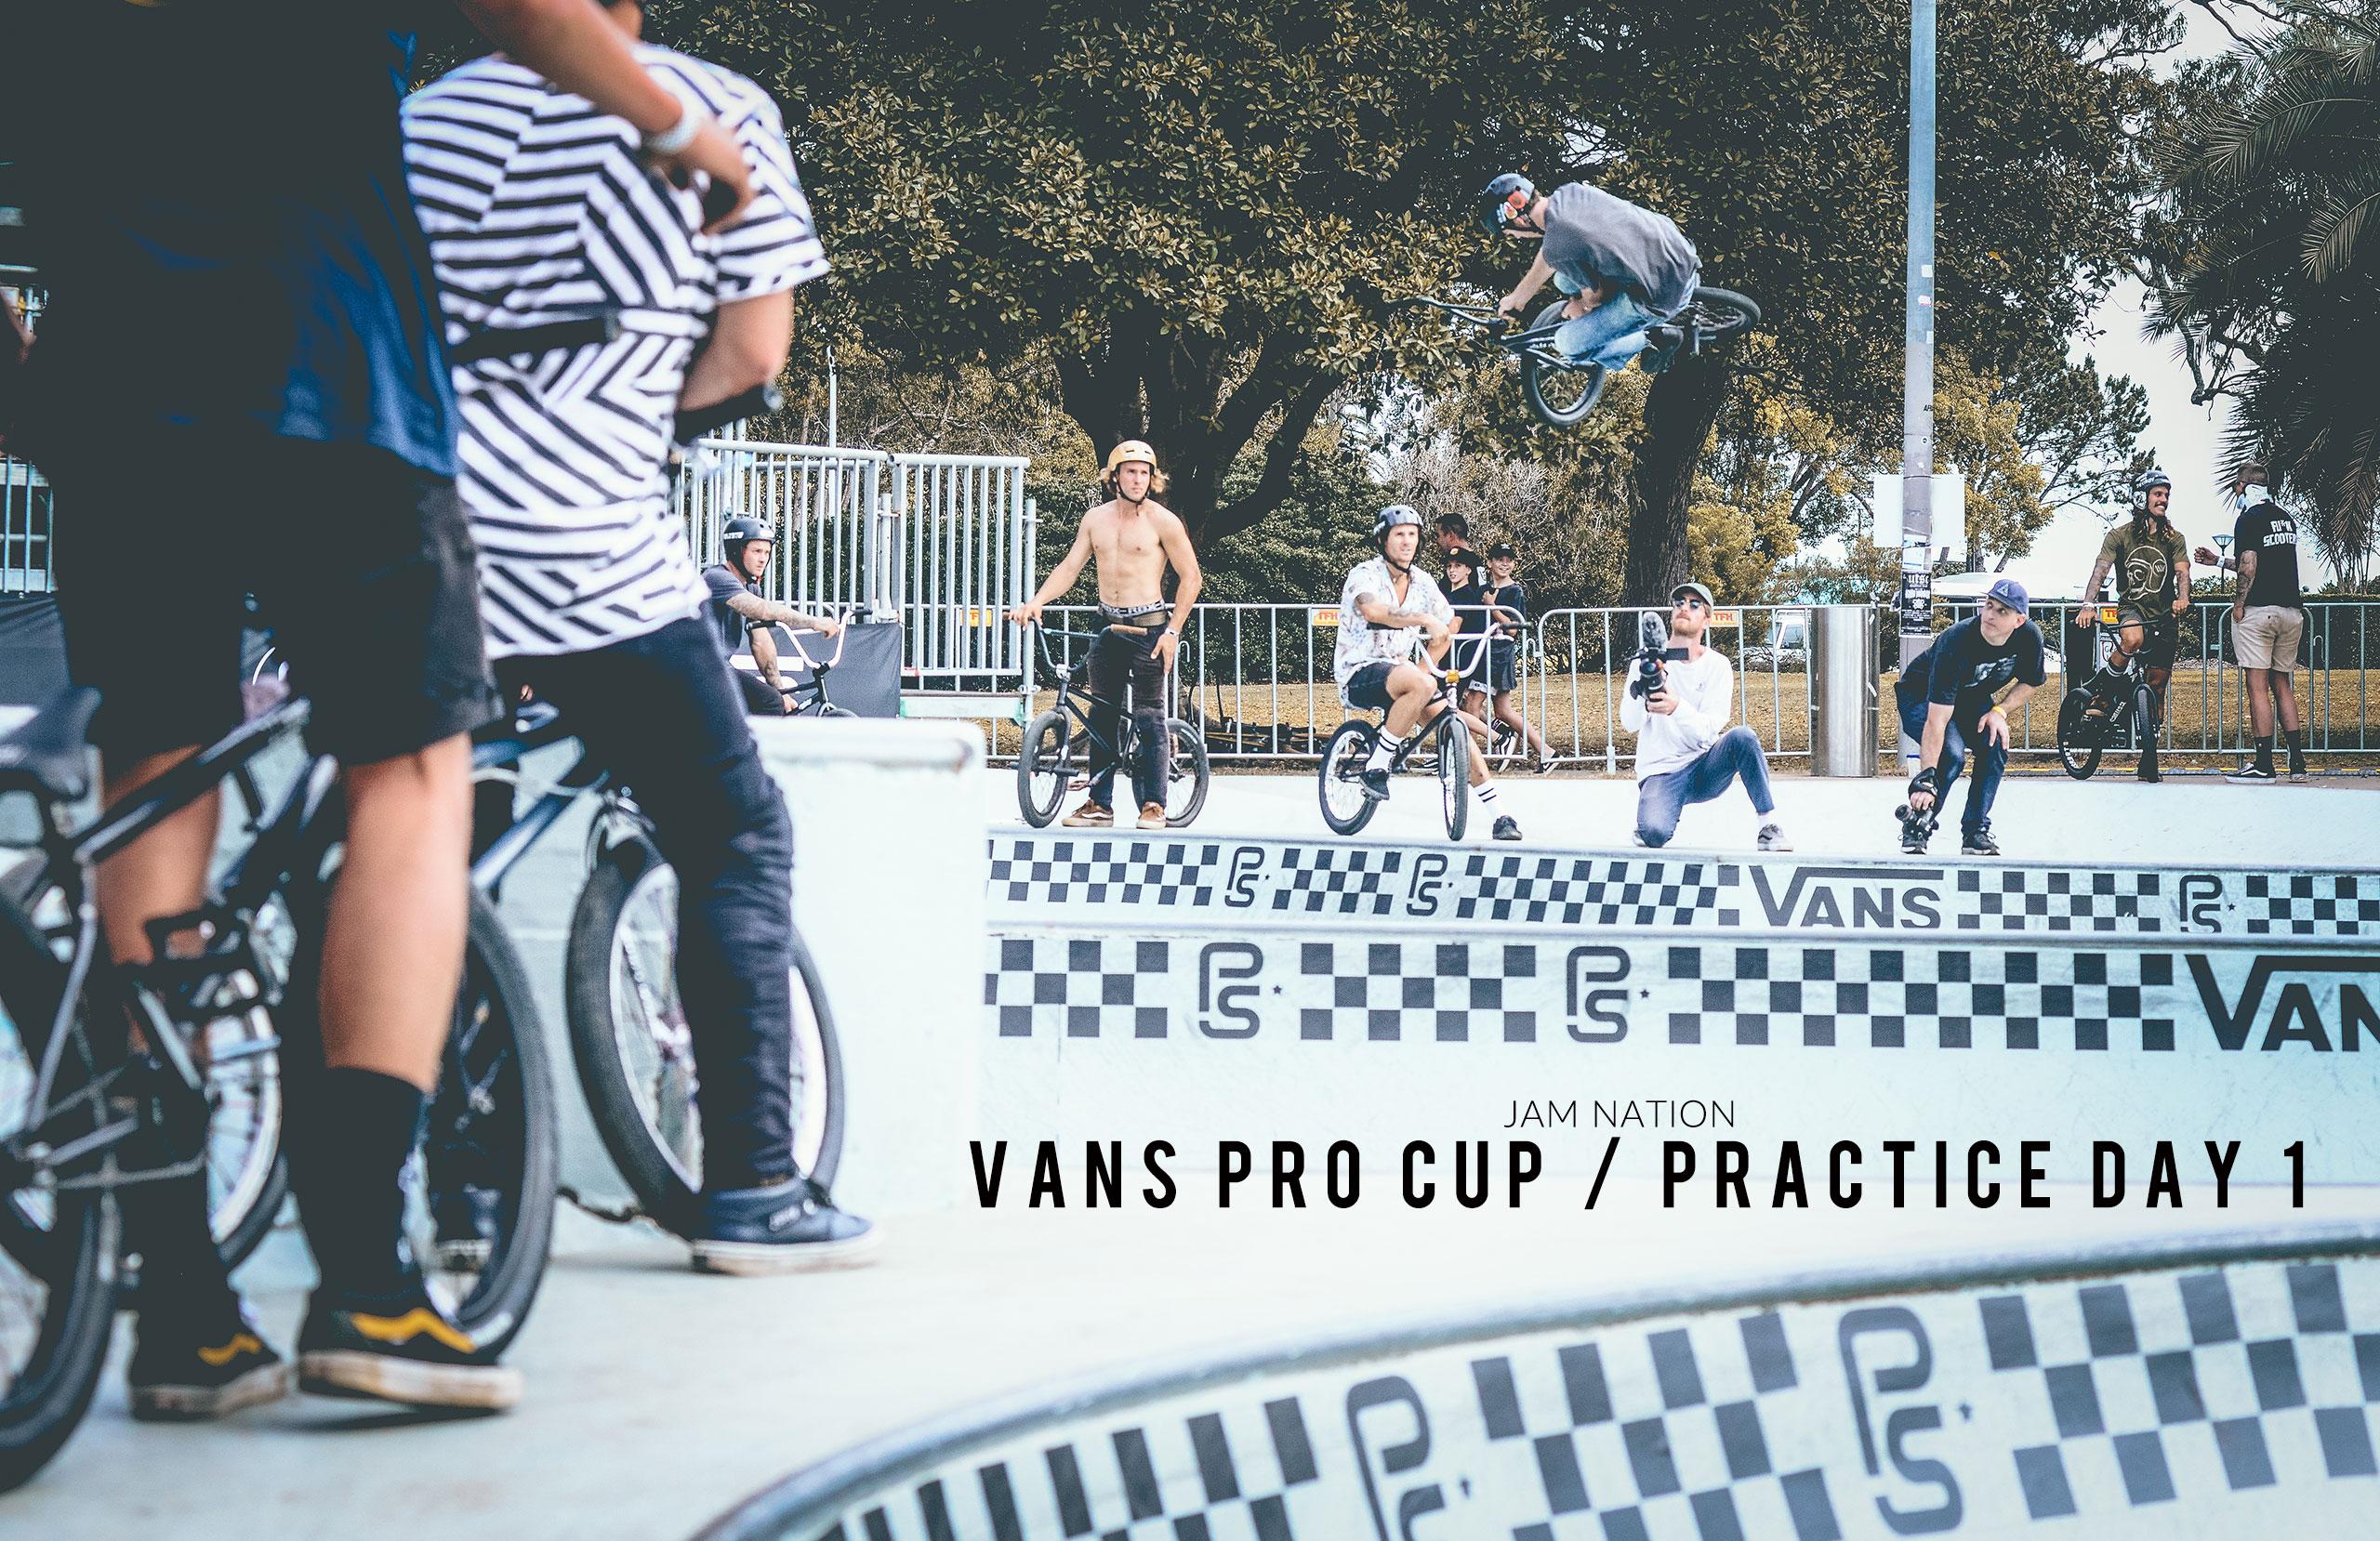 VANS BMX PRO CUP DAY 1 (PRACTICE)